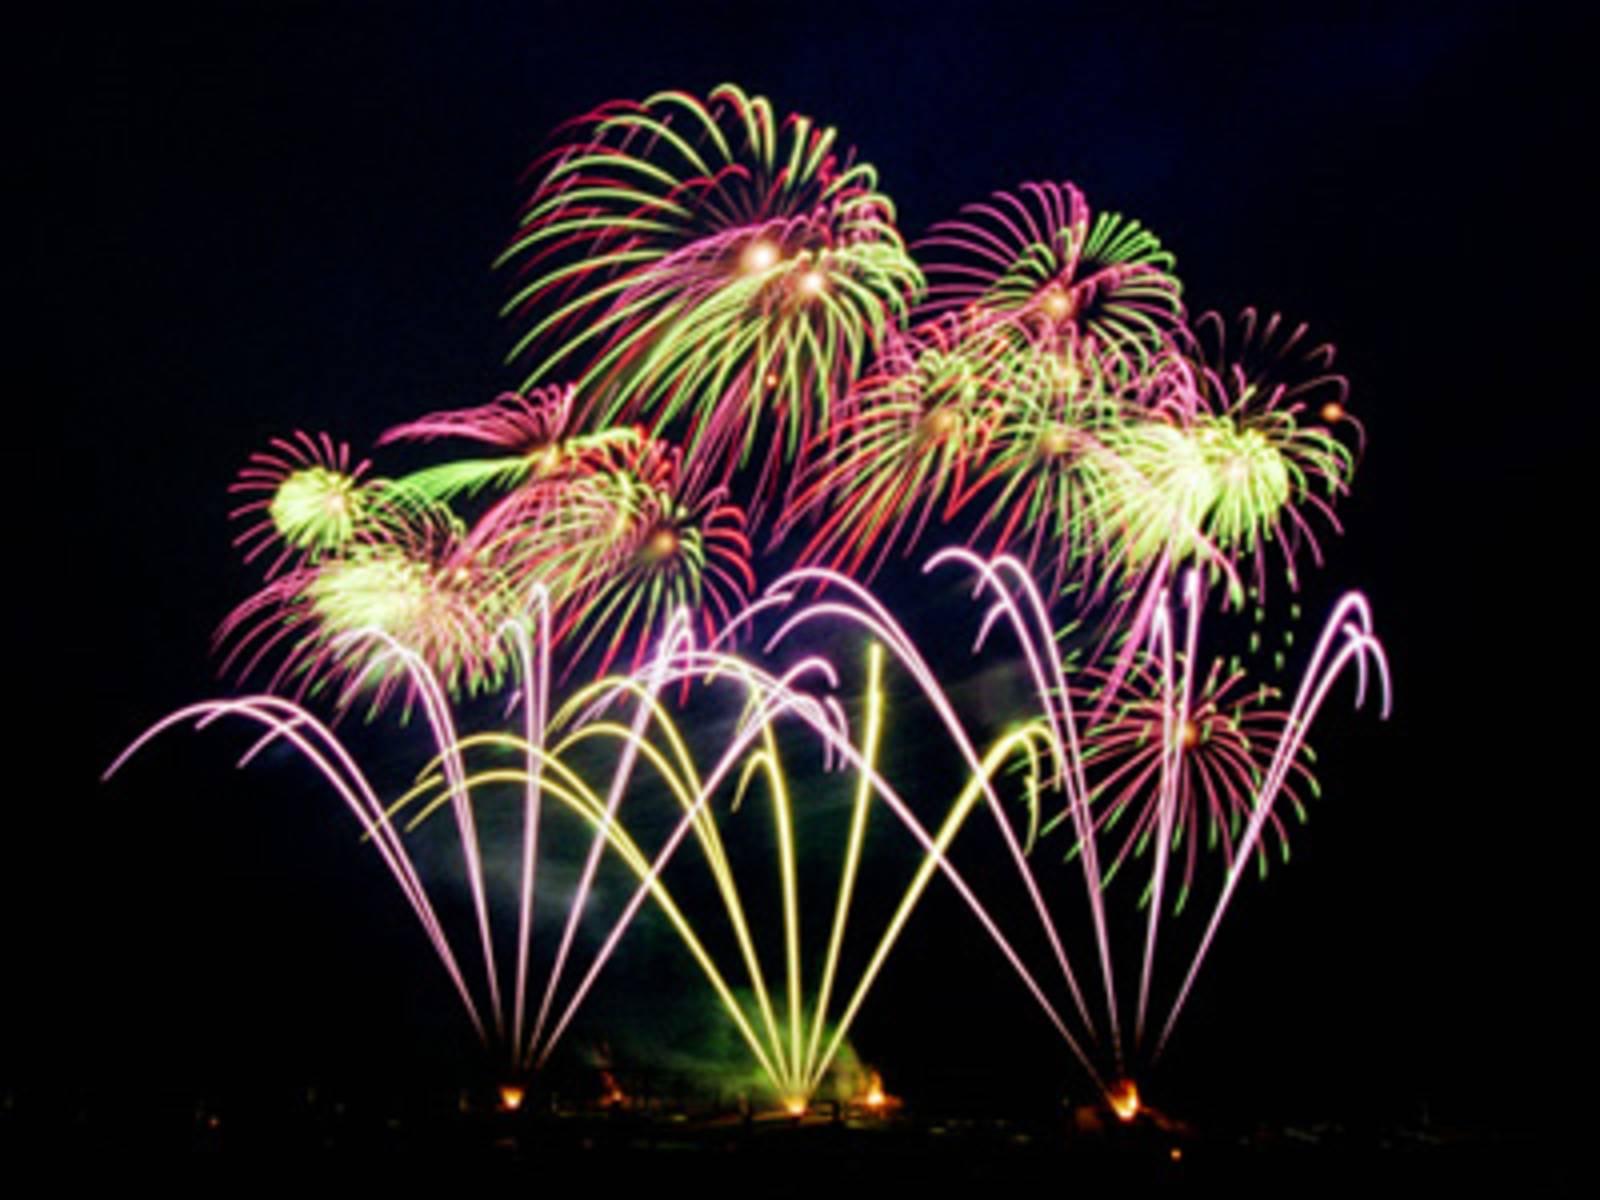 Feuerwerk Göteborgs Fyrverkeri